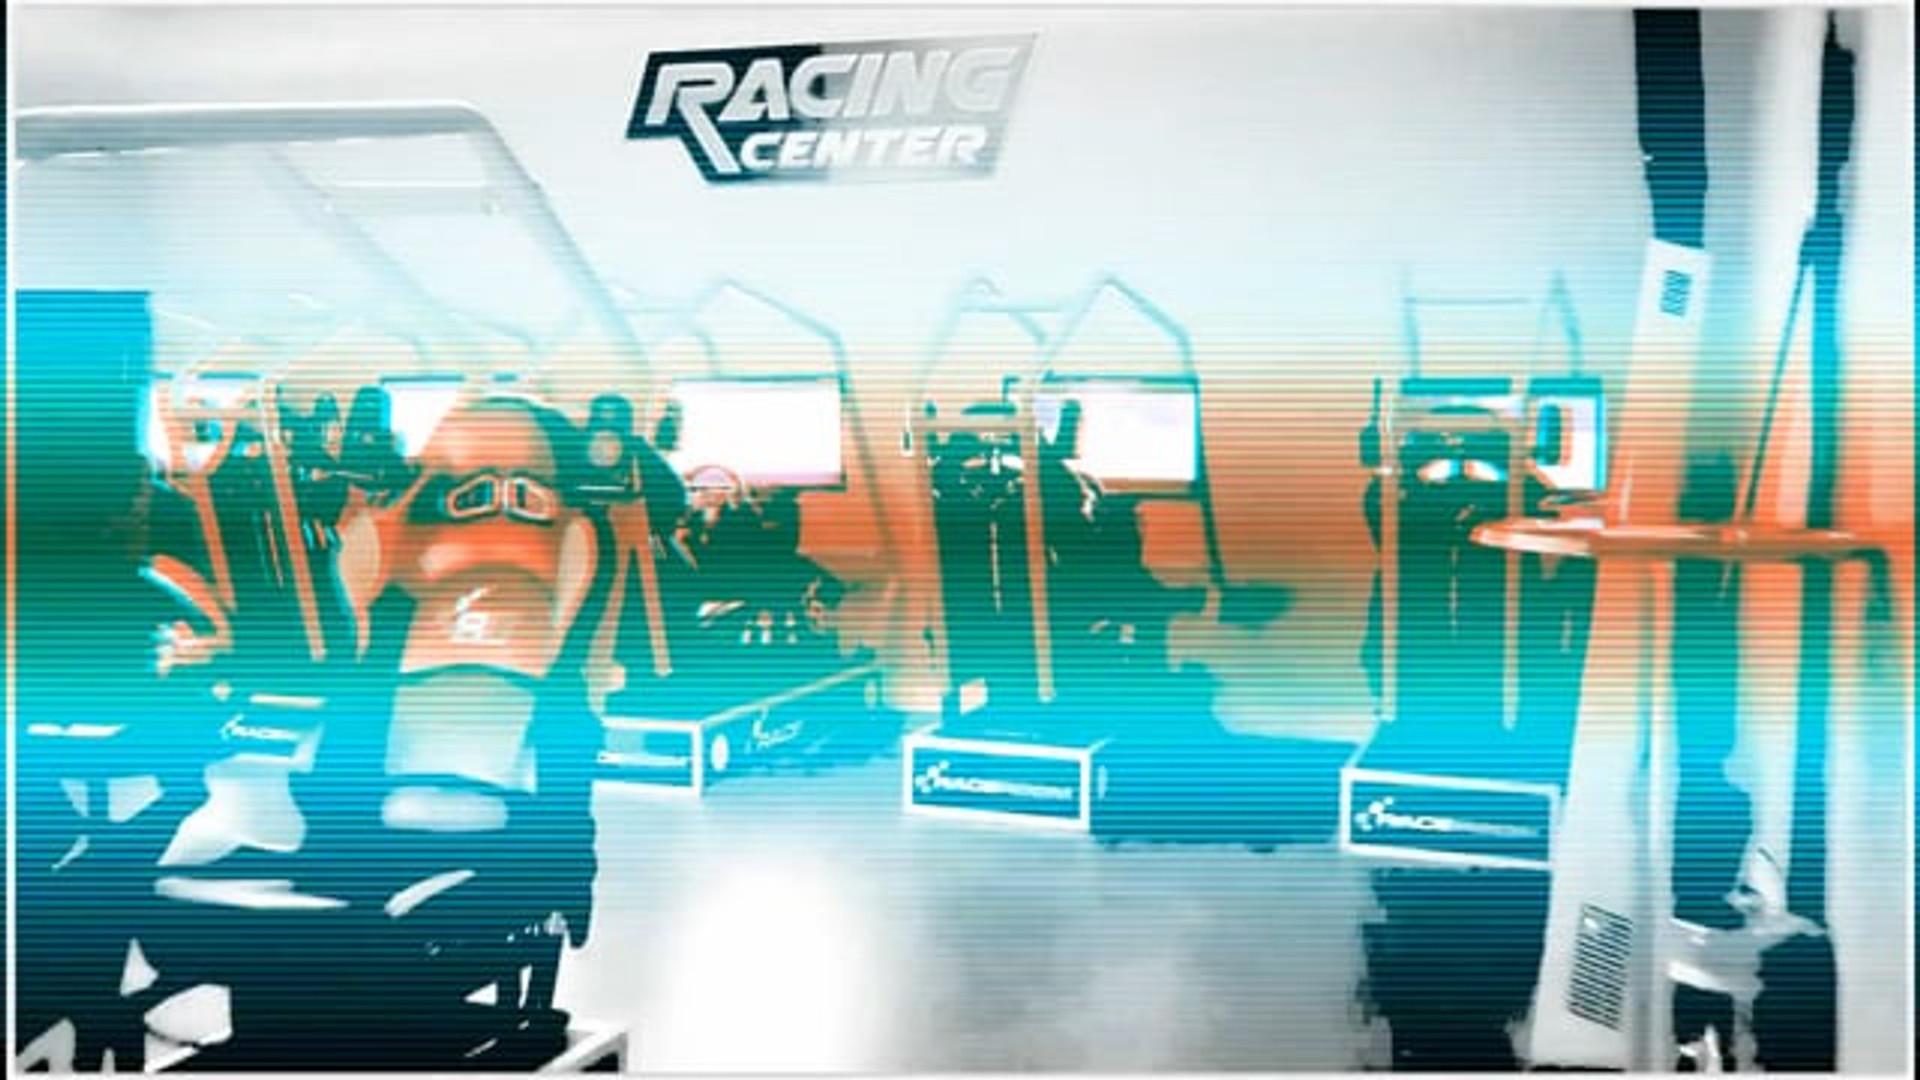 Trailer 2 RacingCenter